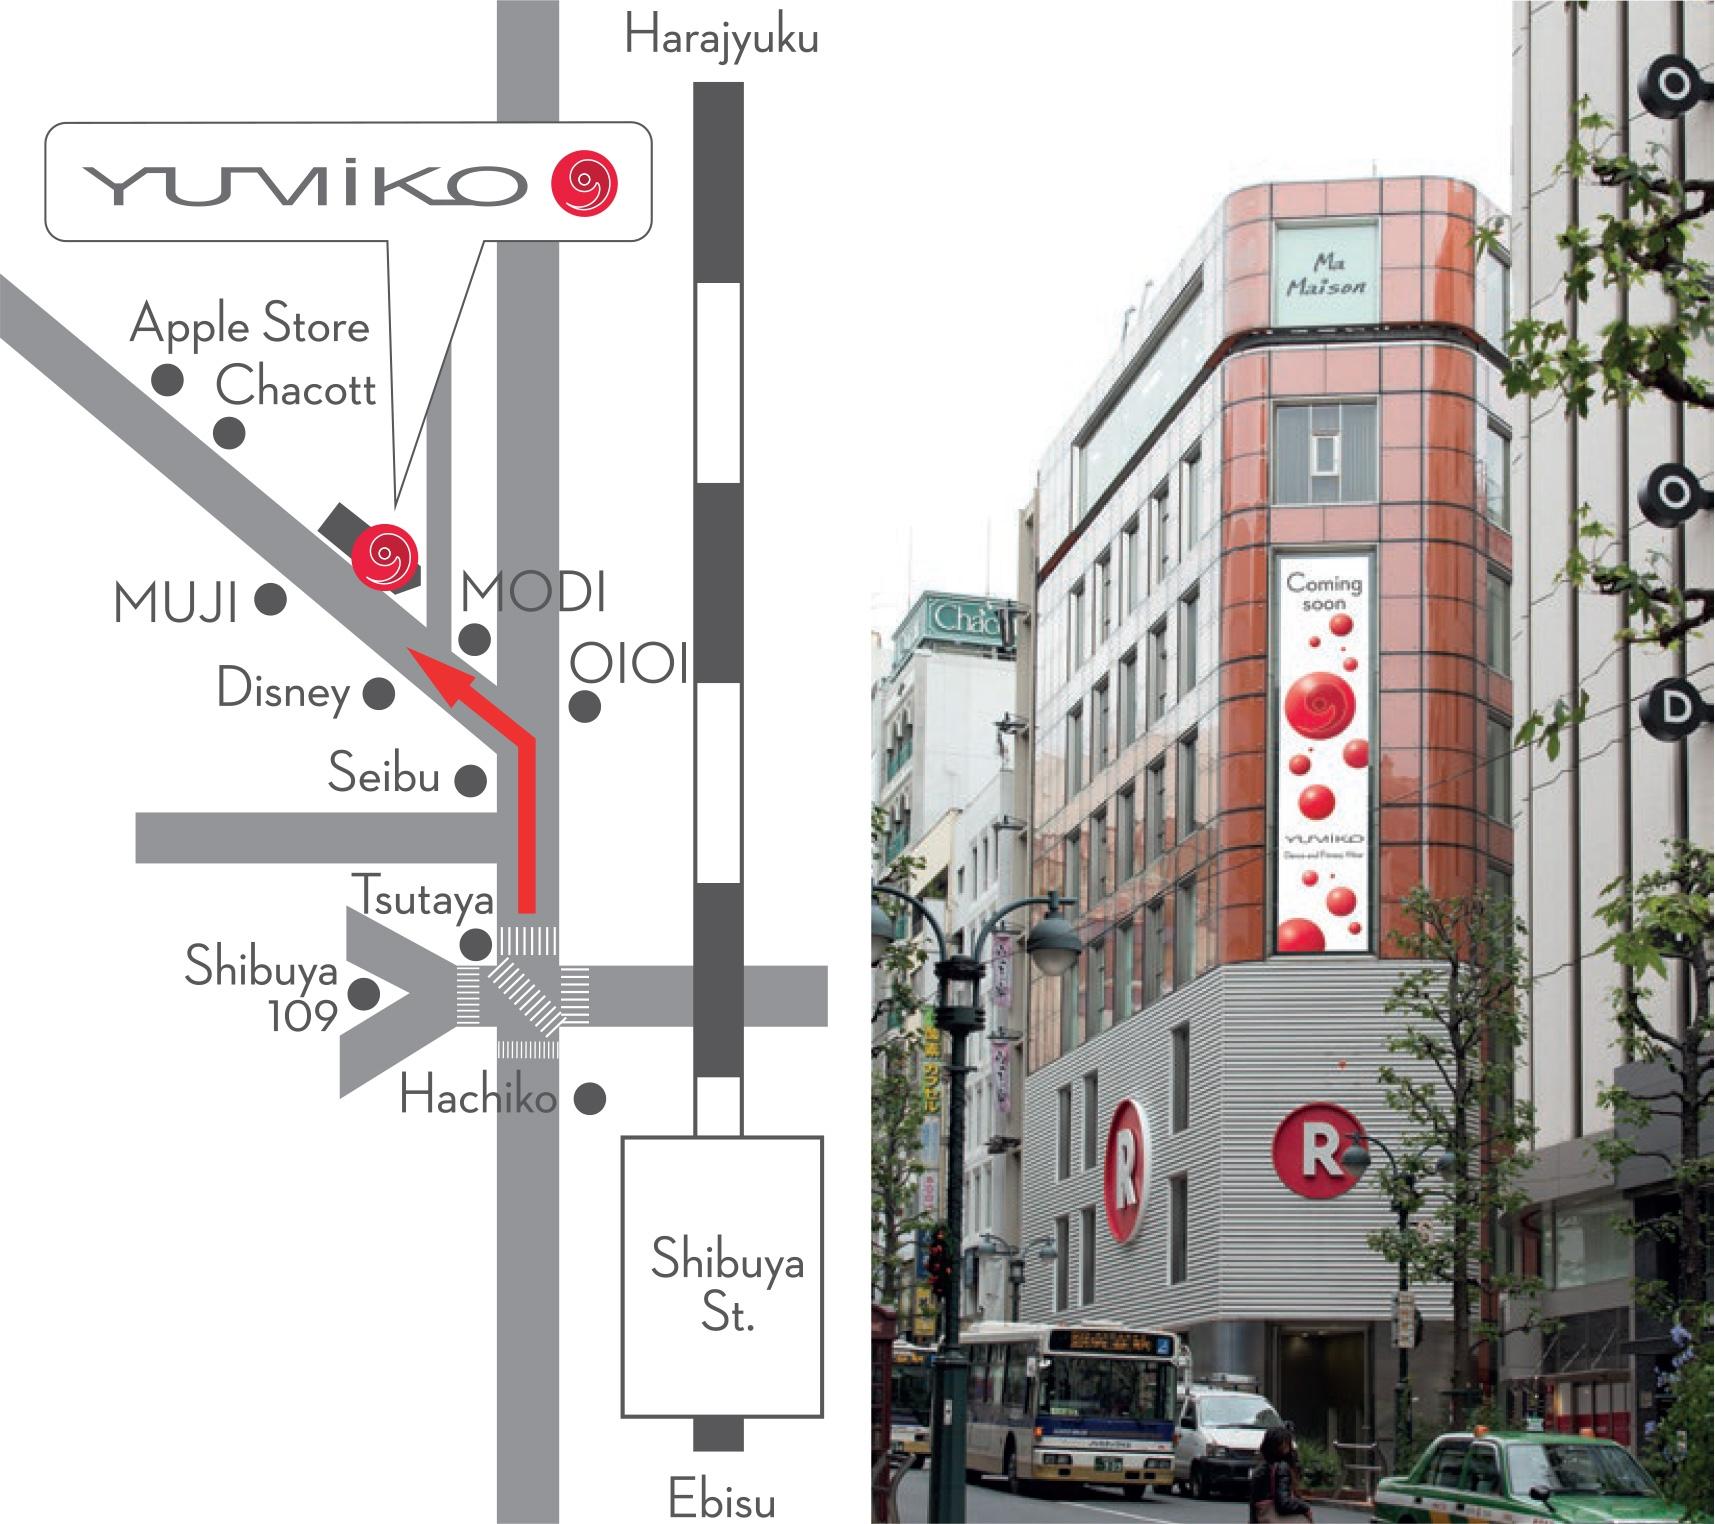 Yumiko Tokyo Boutique Map Route